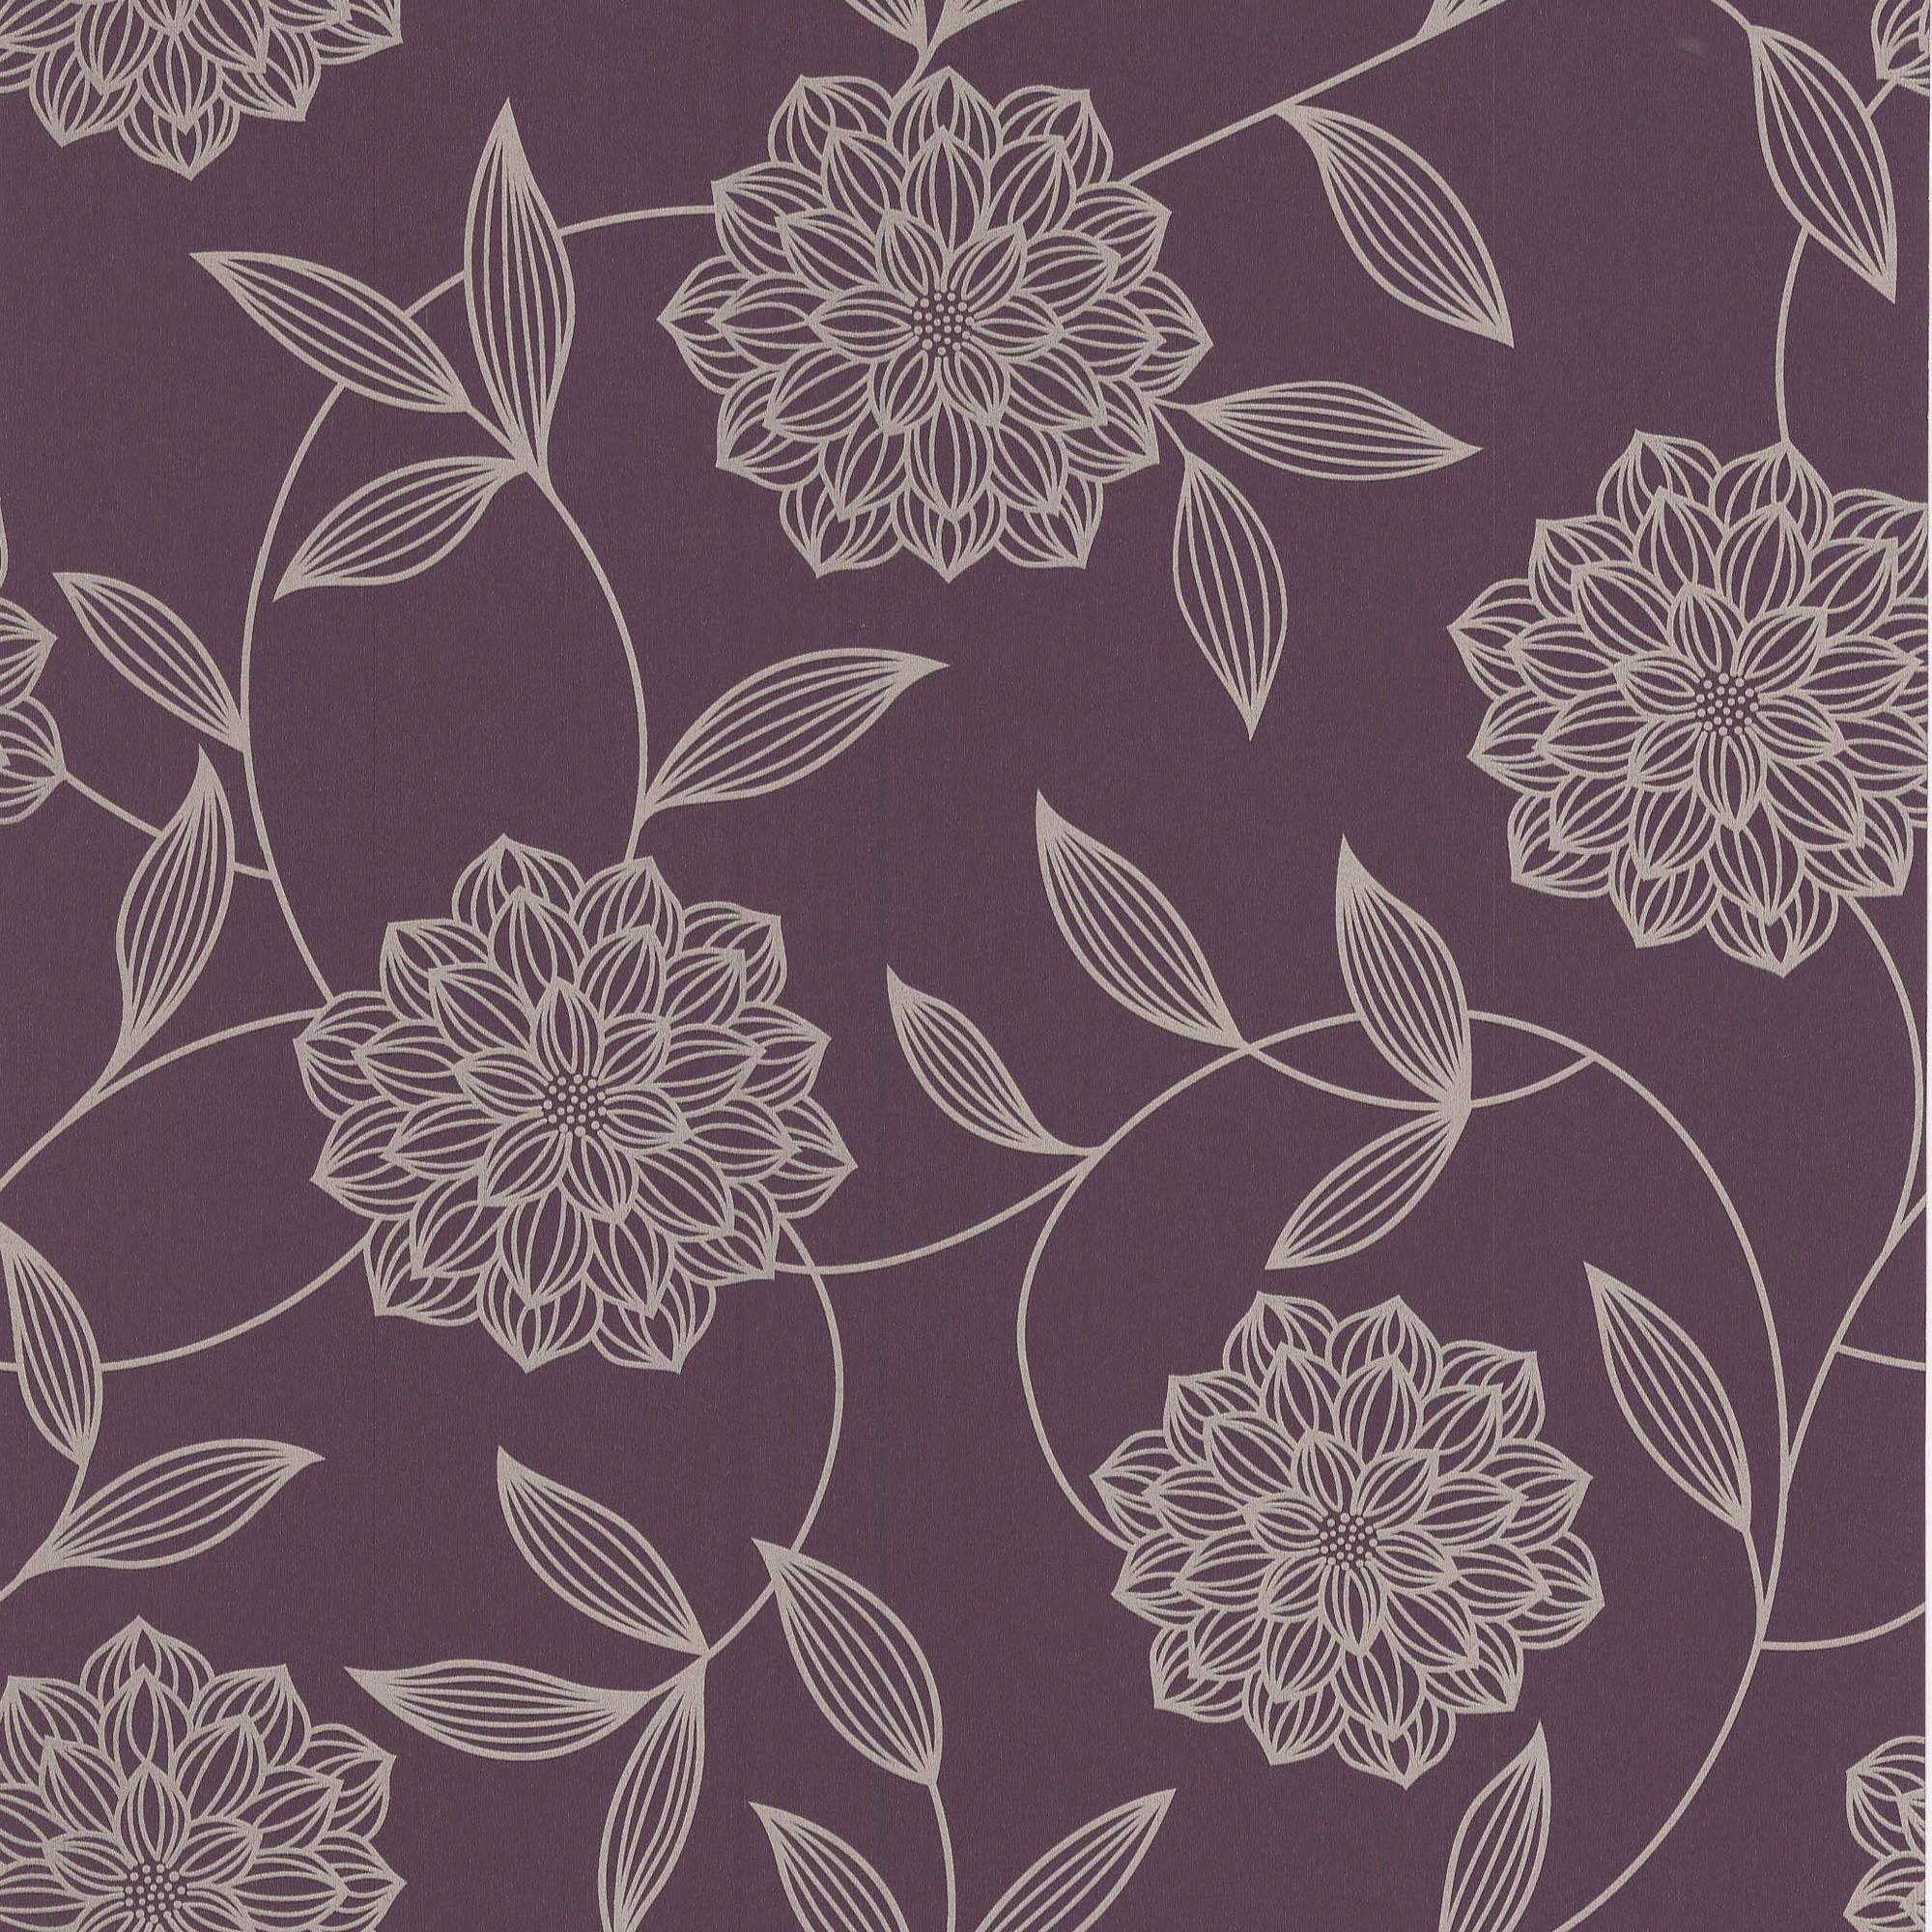 Home diy wallpaper illustration arthouse imagine fern plum motif vinyl - Wallpaper